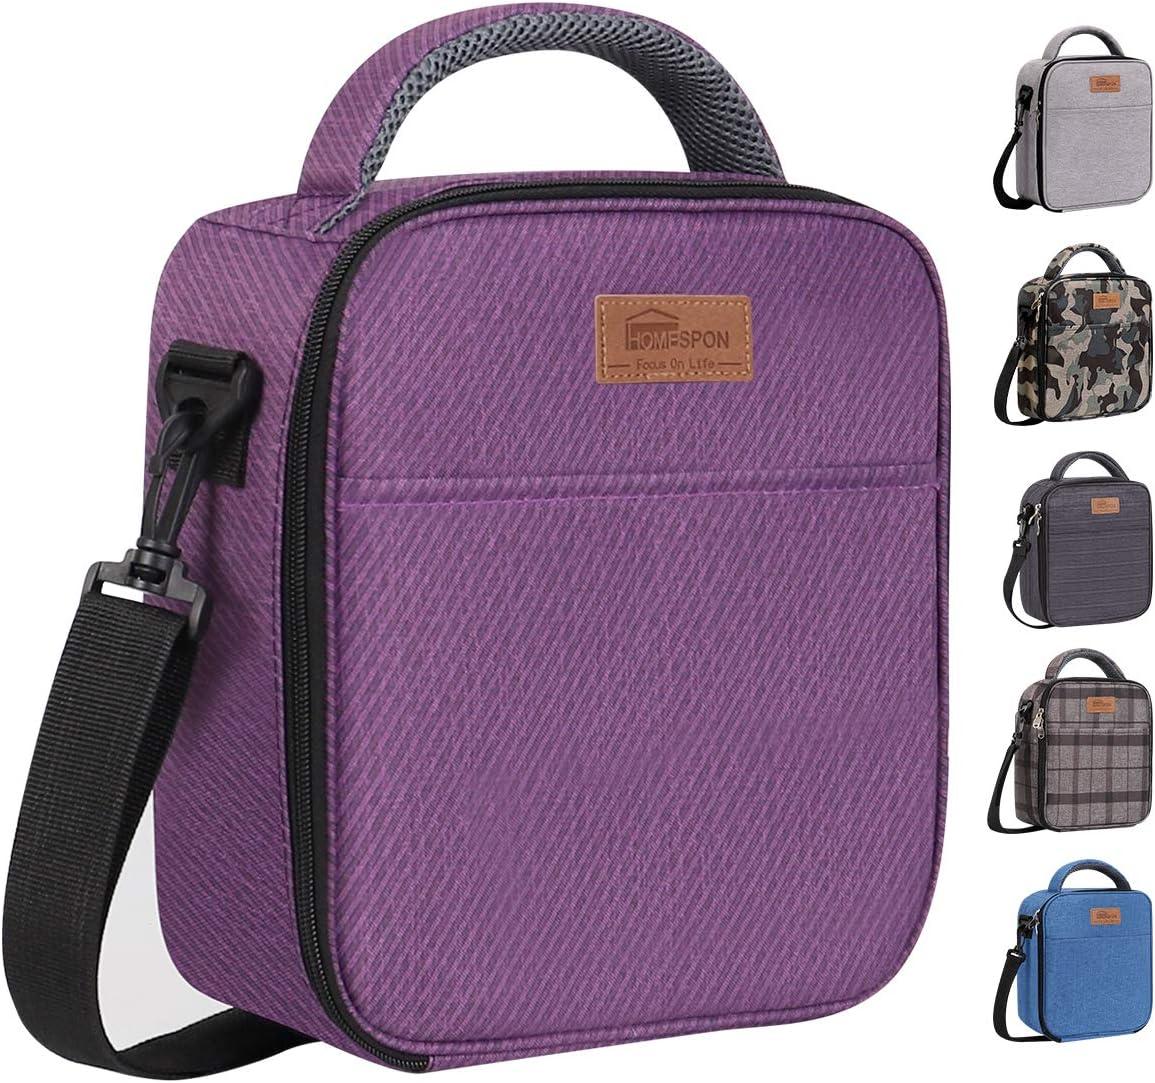 Estudiantes y Ni/ños HOMESPON Bolsa Isot/érmica de Almuerzo Lunch Bag Bolsa T/érmica Porta Alimentos Tela Impermeable Plegable Bolso de Picnic para Mujeres Adultos